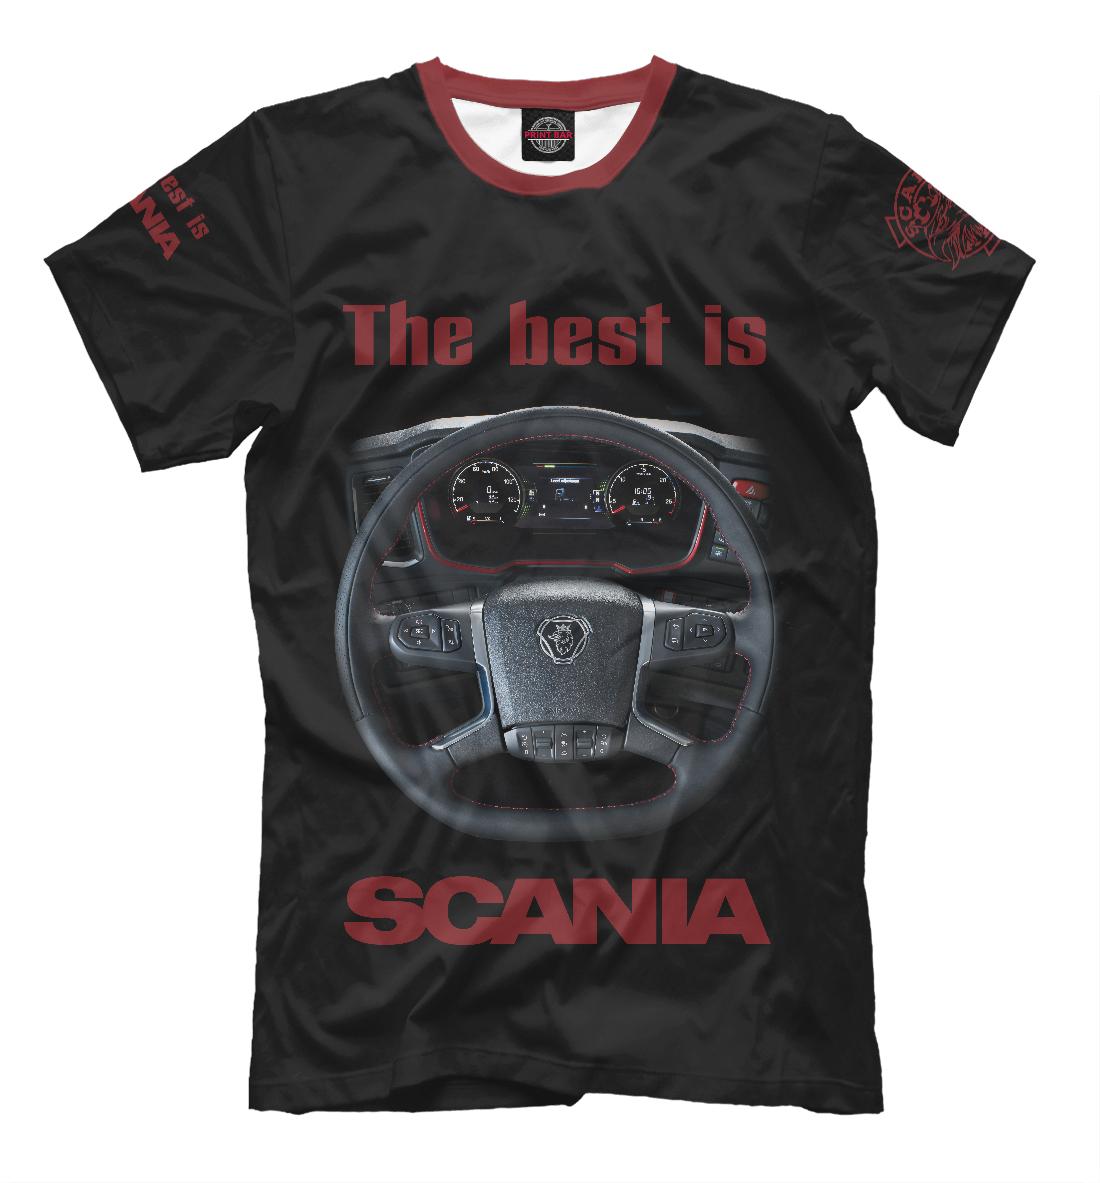 Купить The best is SCANIA, Printbar, Футболки, GRZ-681387-fut-2